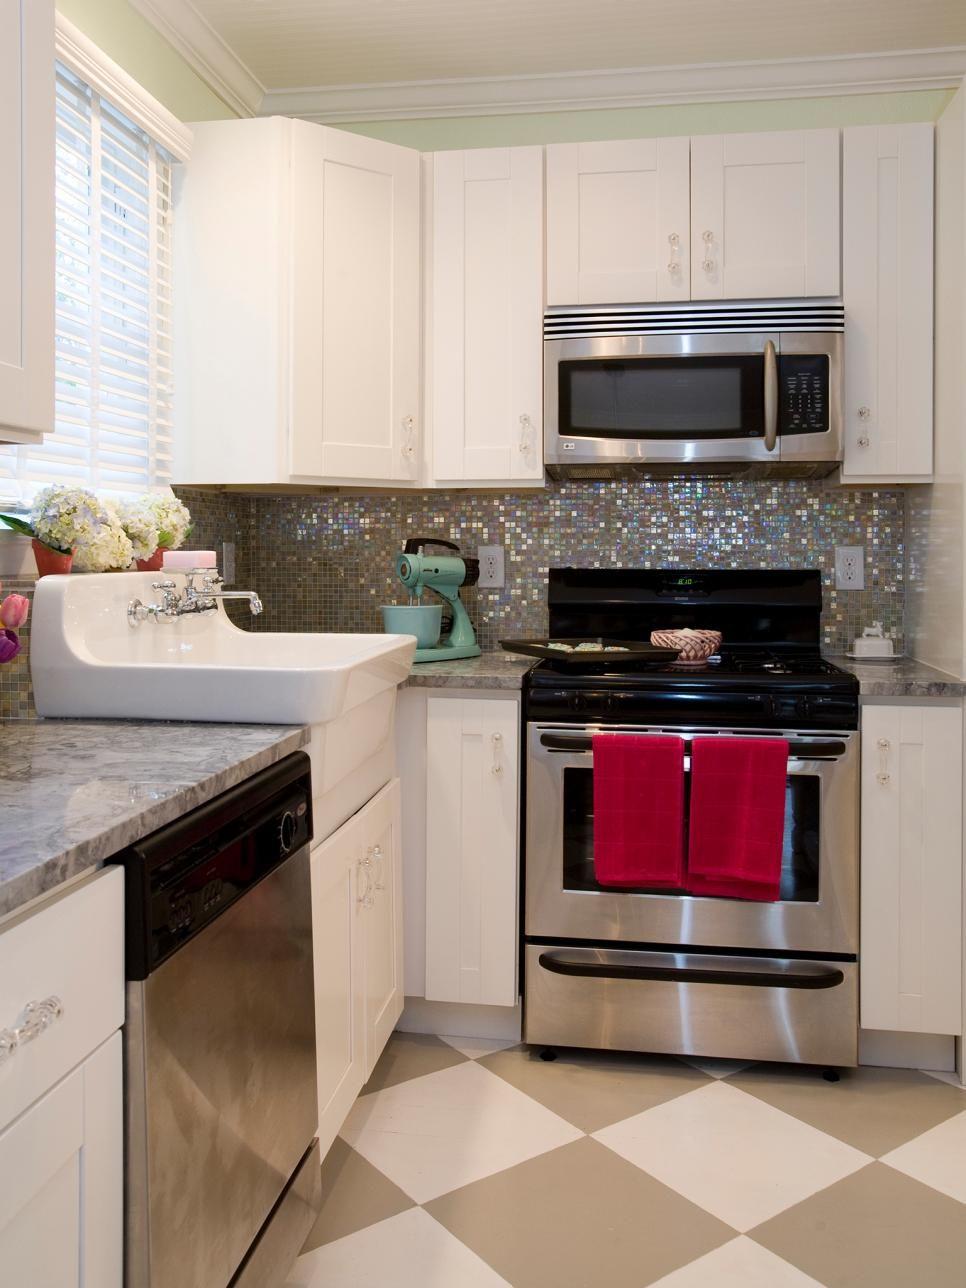 Pictures of kitchen backsplash ideas from white farmhouse sink